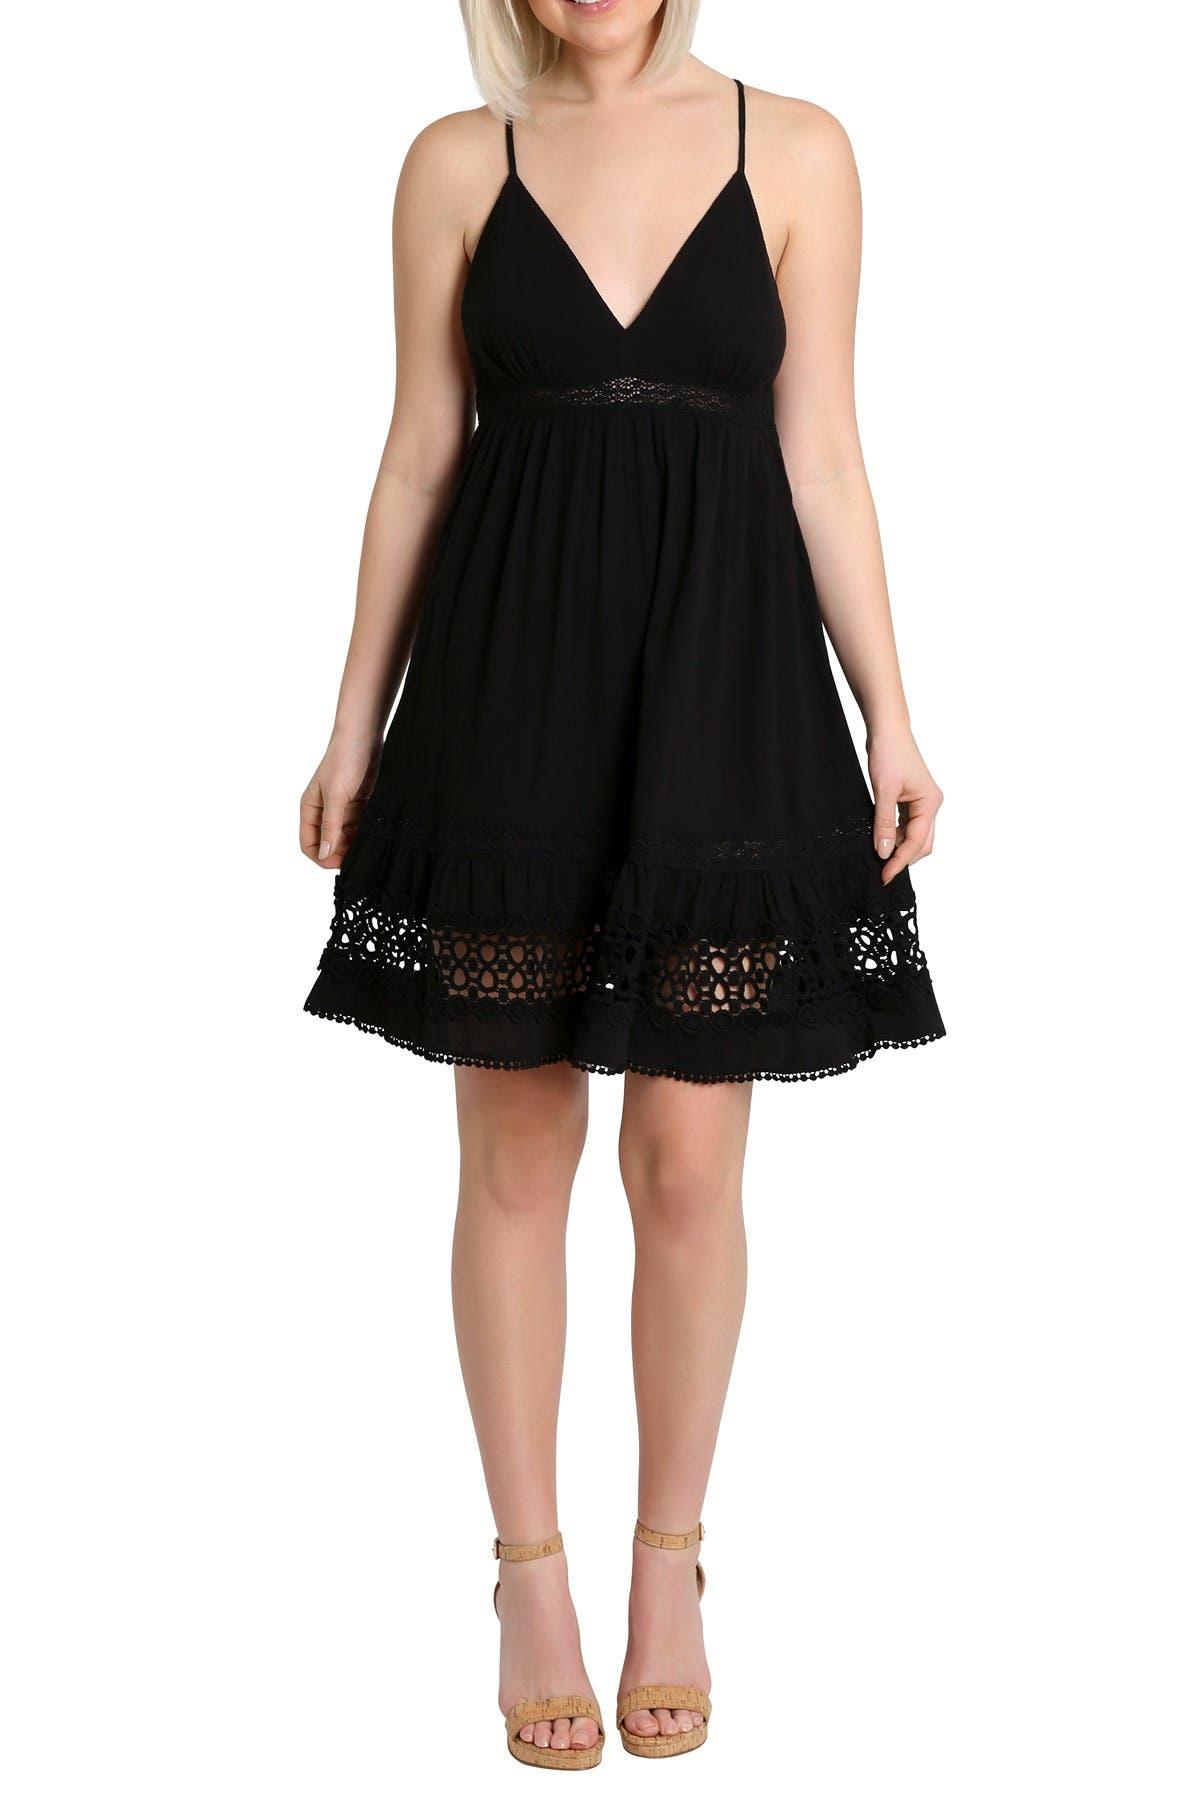 Image of NANETTE nanette lepore Stella Spaghetti Crochet Dress